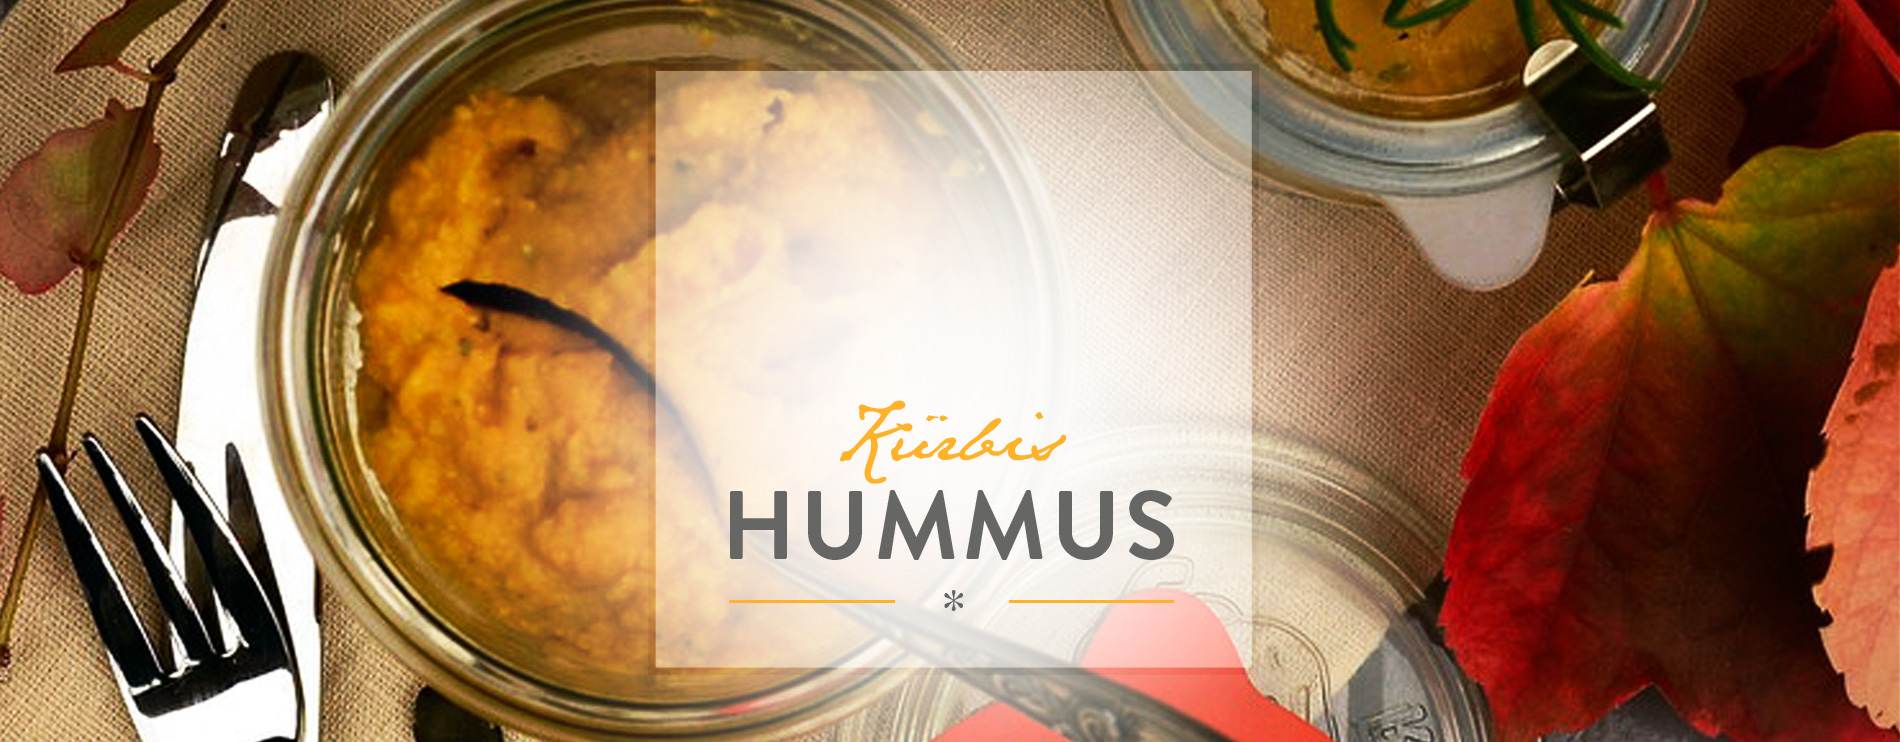 Header Kürbis Hummus